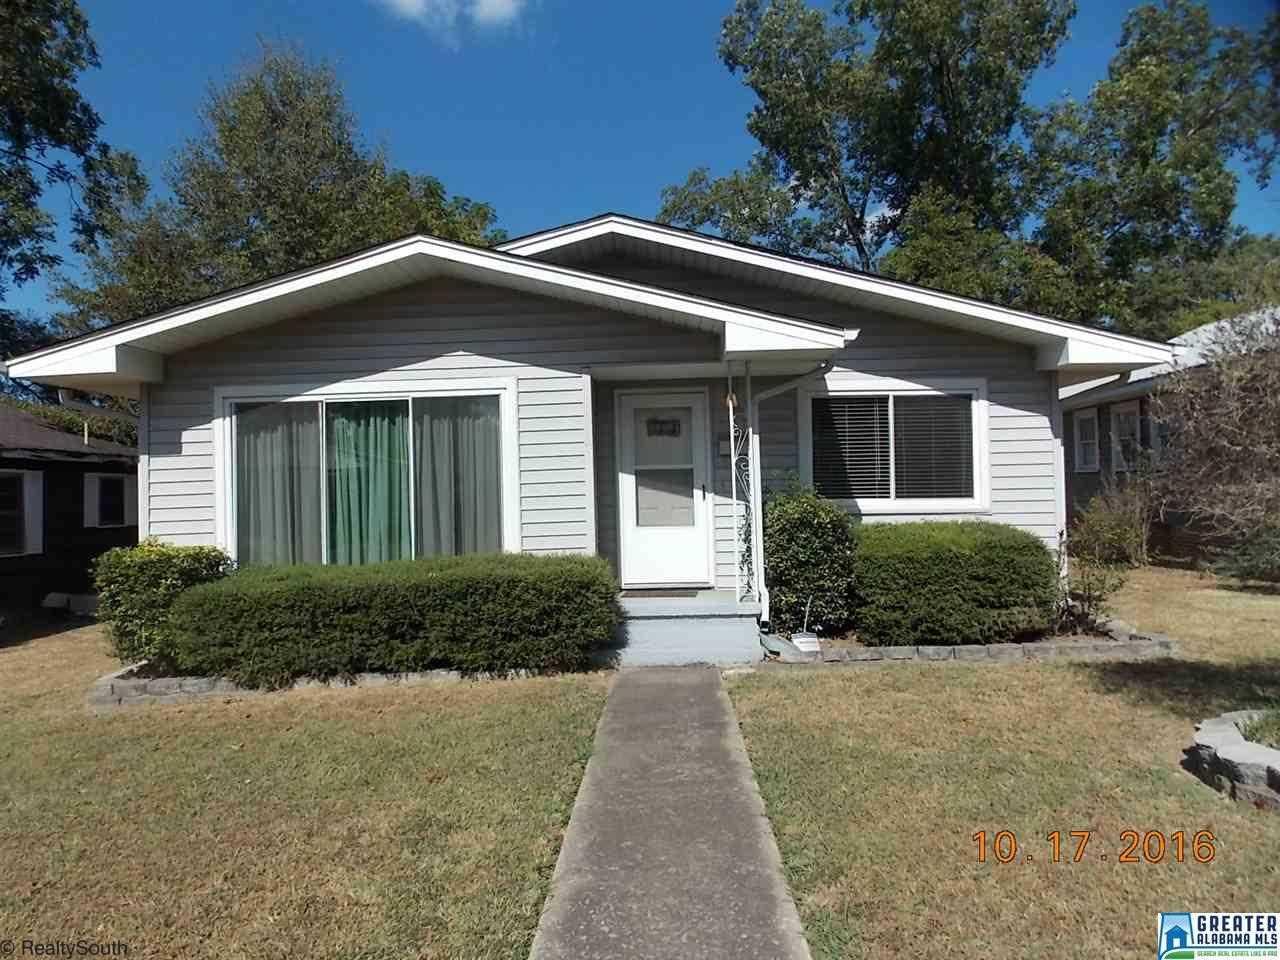 1806 S 5th Ave, Irondale, AL - USA (photo 1)